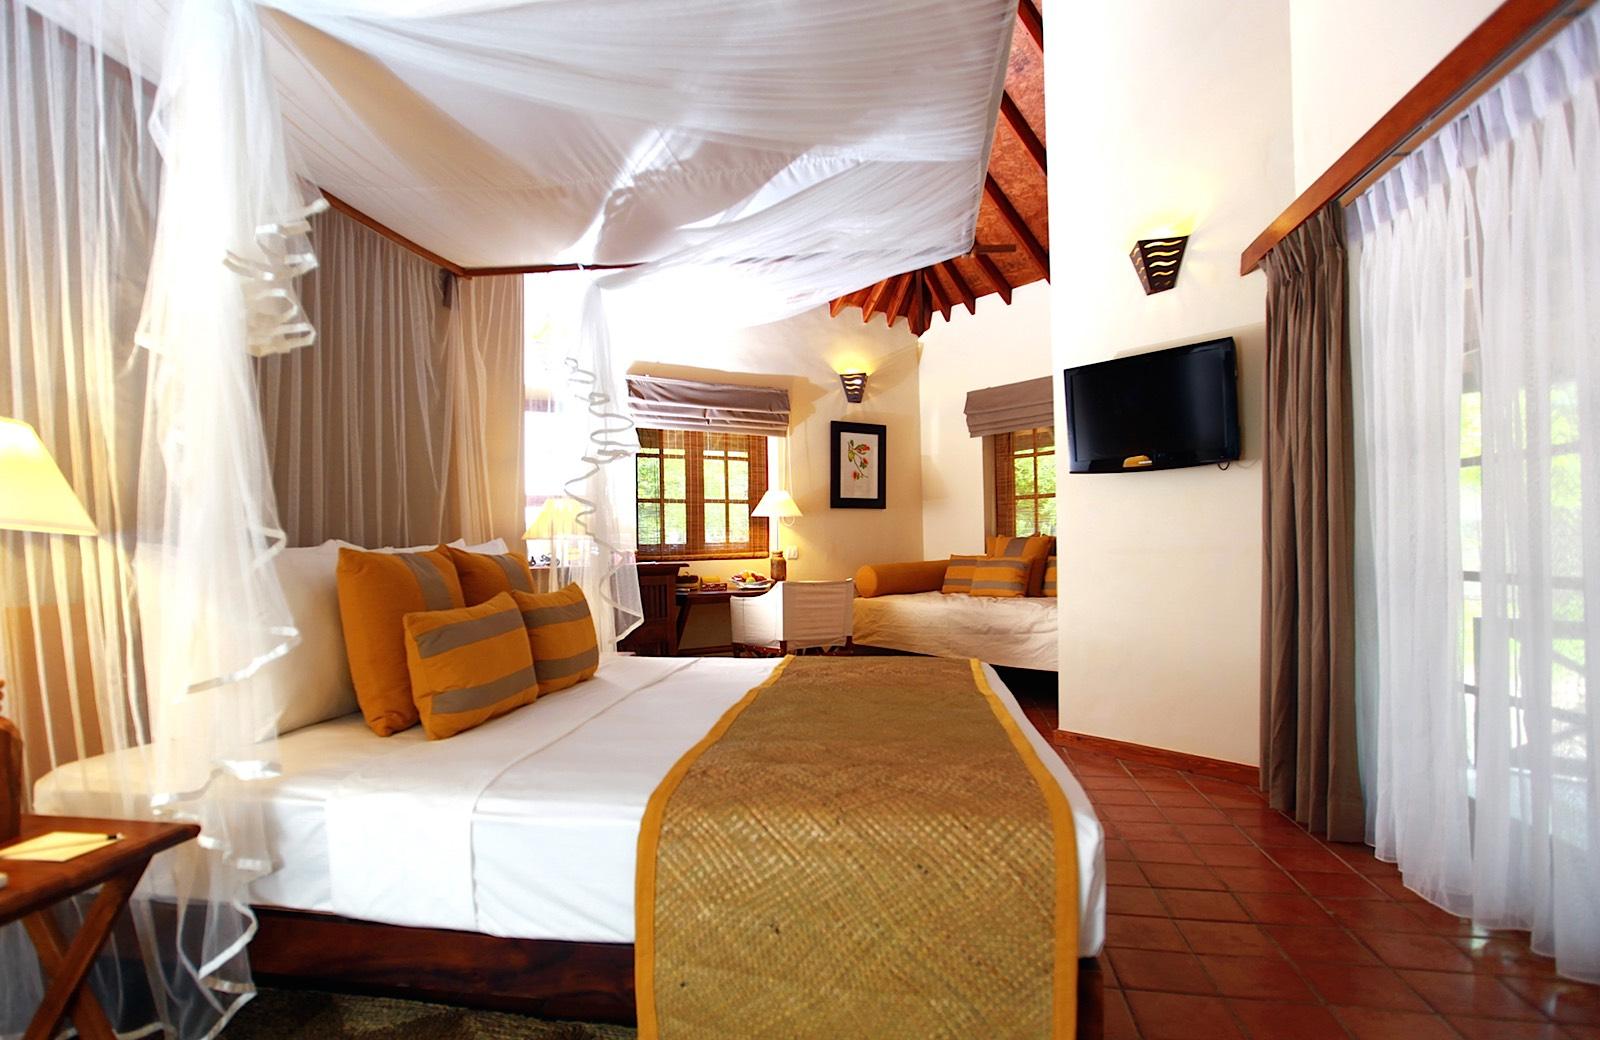 invite-to-paradise-holiday-honeymoon-sri-lanka-specialists-safari-lodge-cinnamon-wild-jungle-chalet-3.jpg